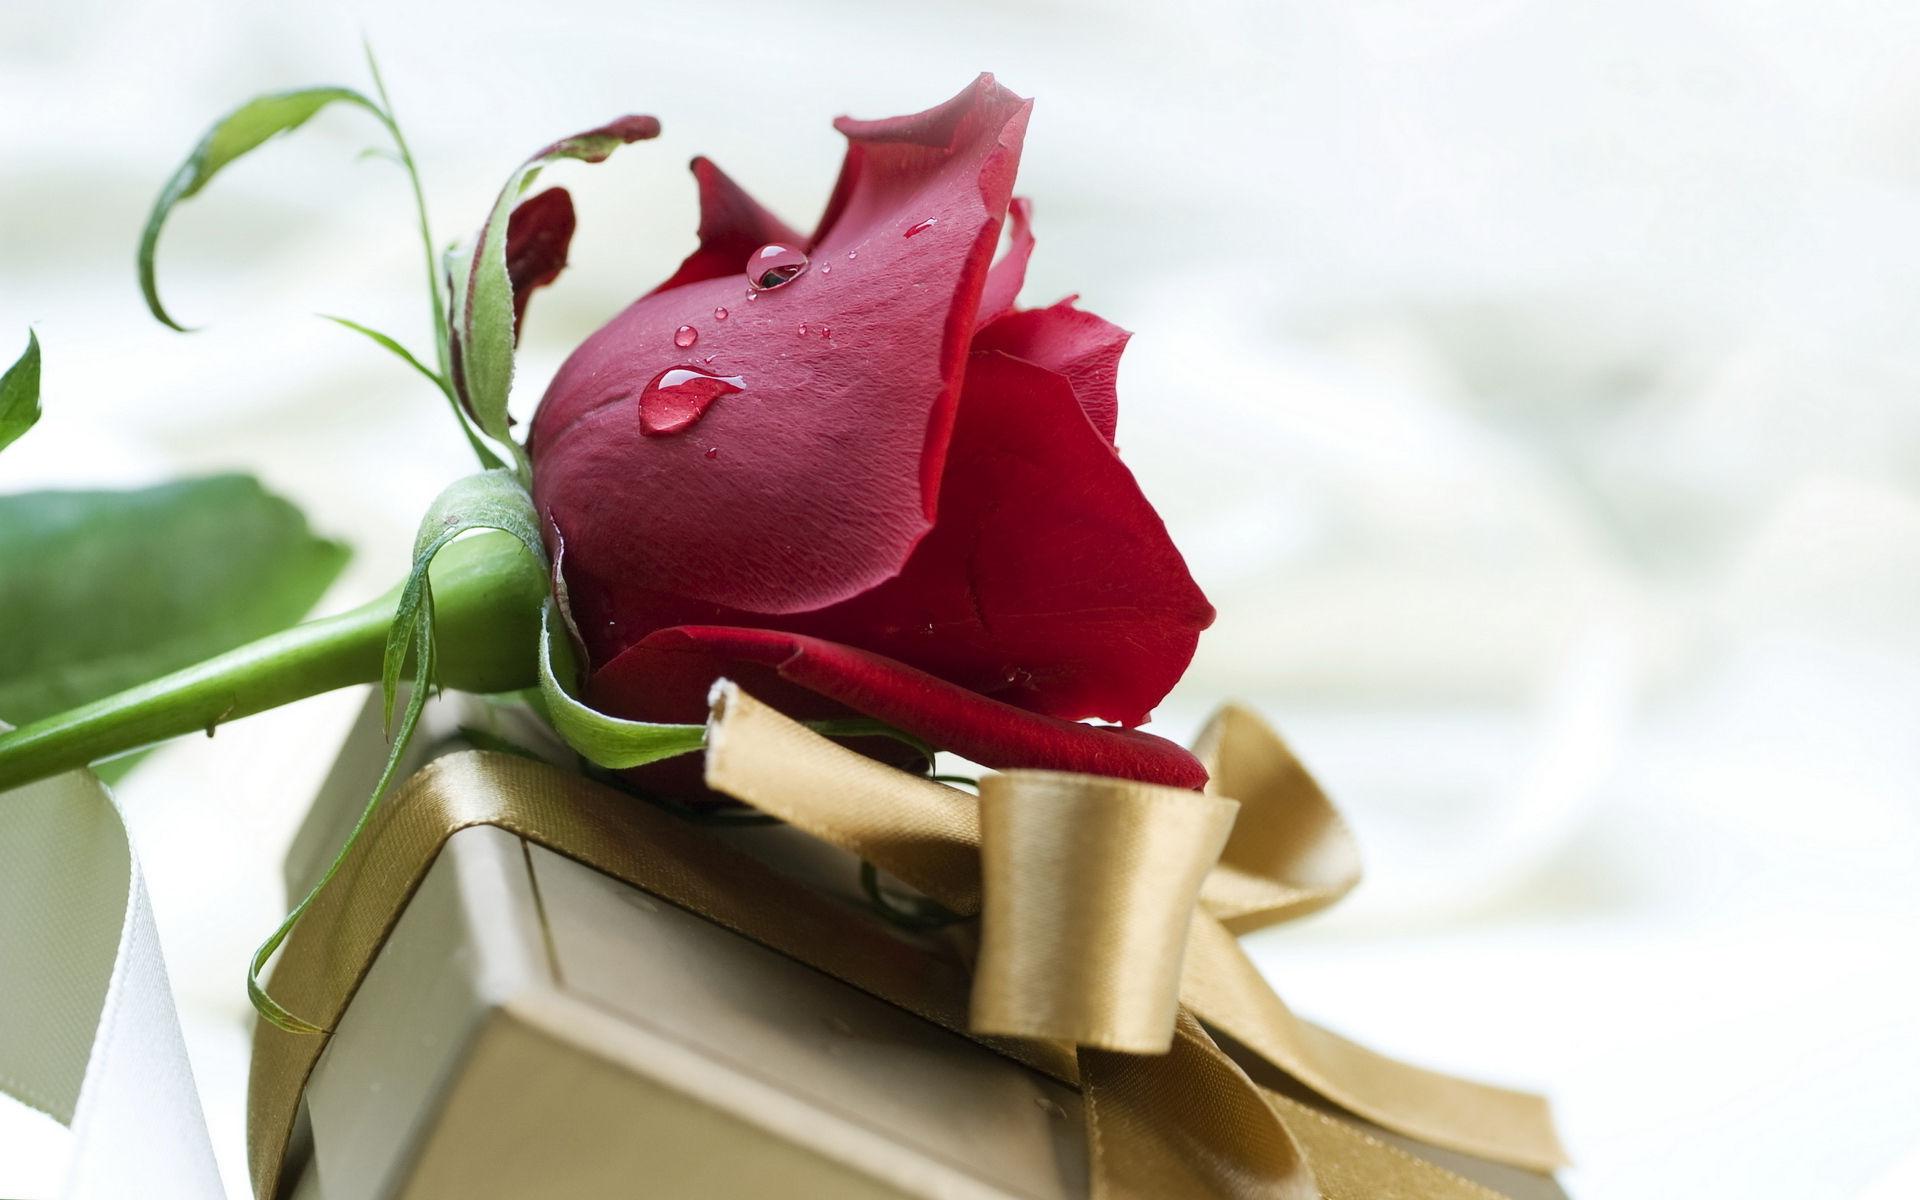 fonds d'écran st-valentin fleur rose - maximumwallhd